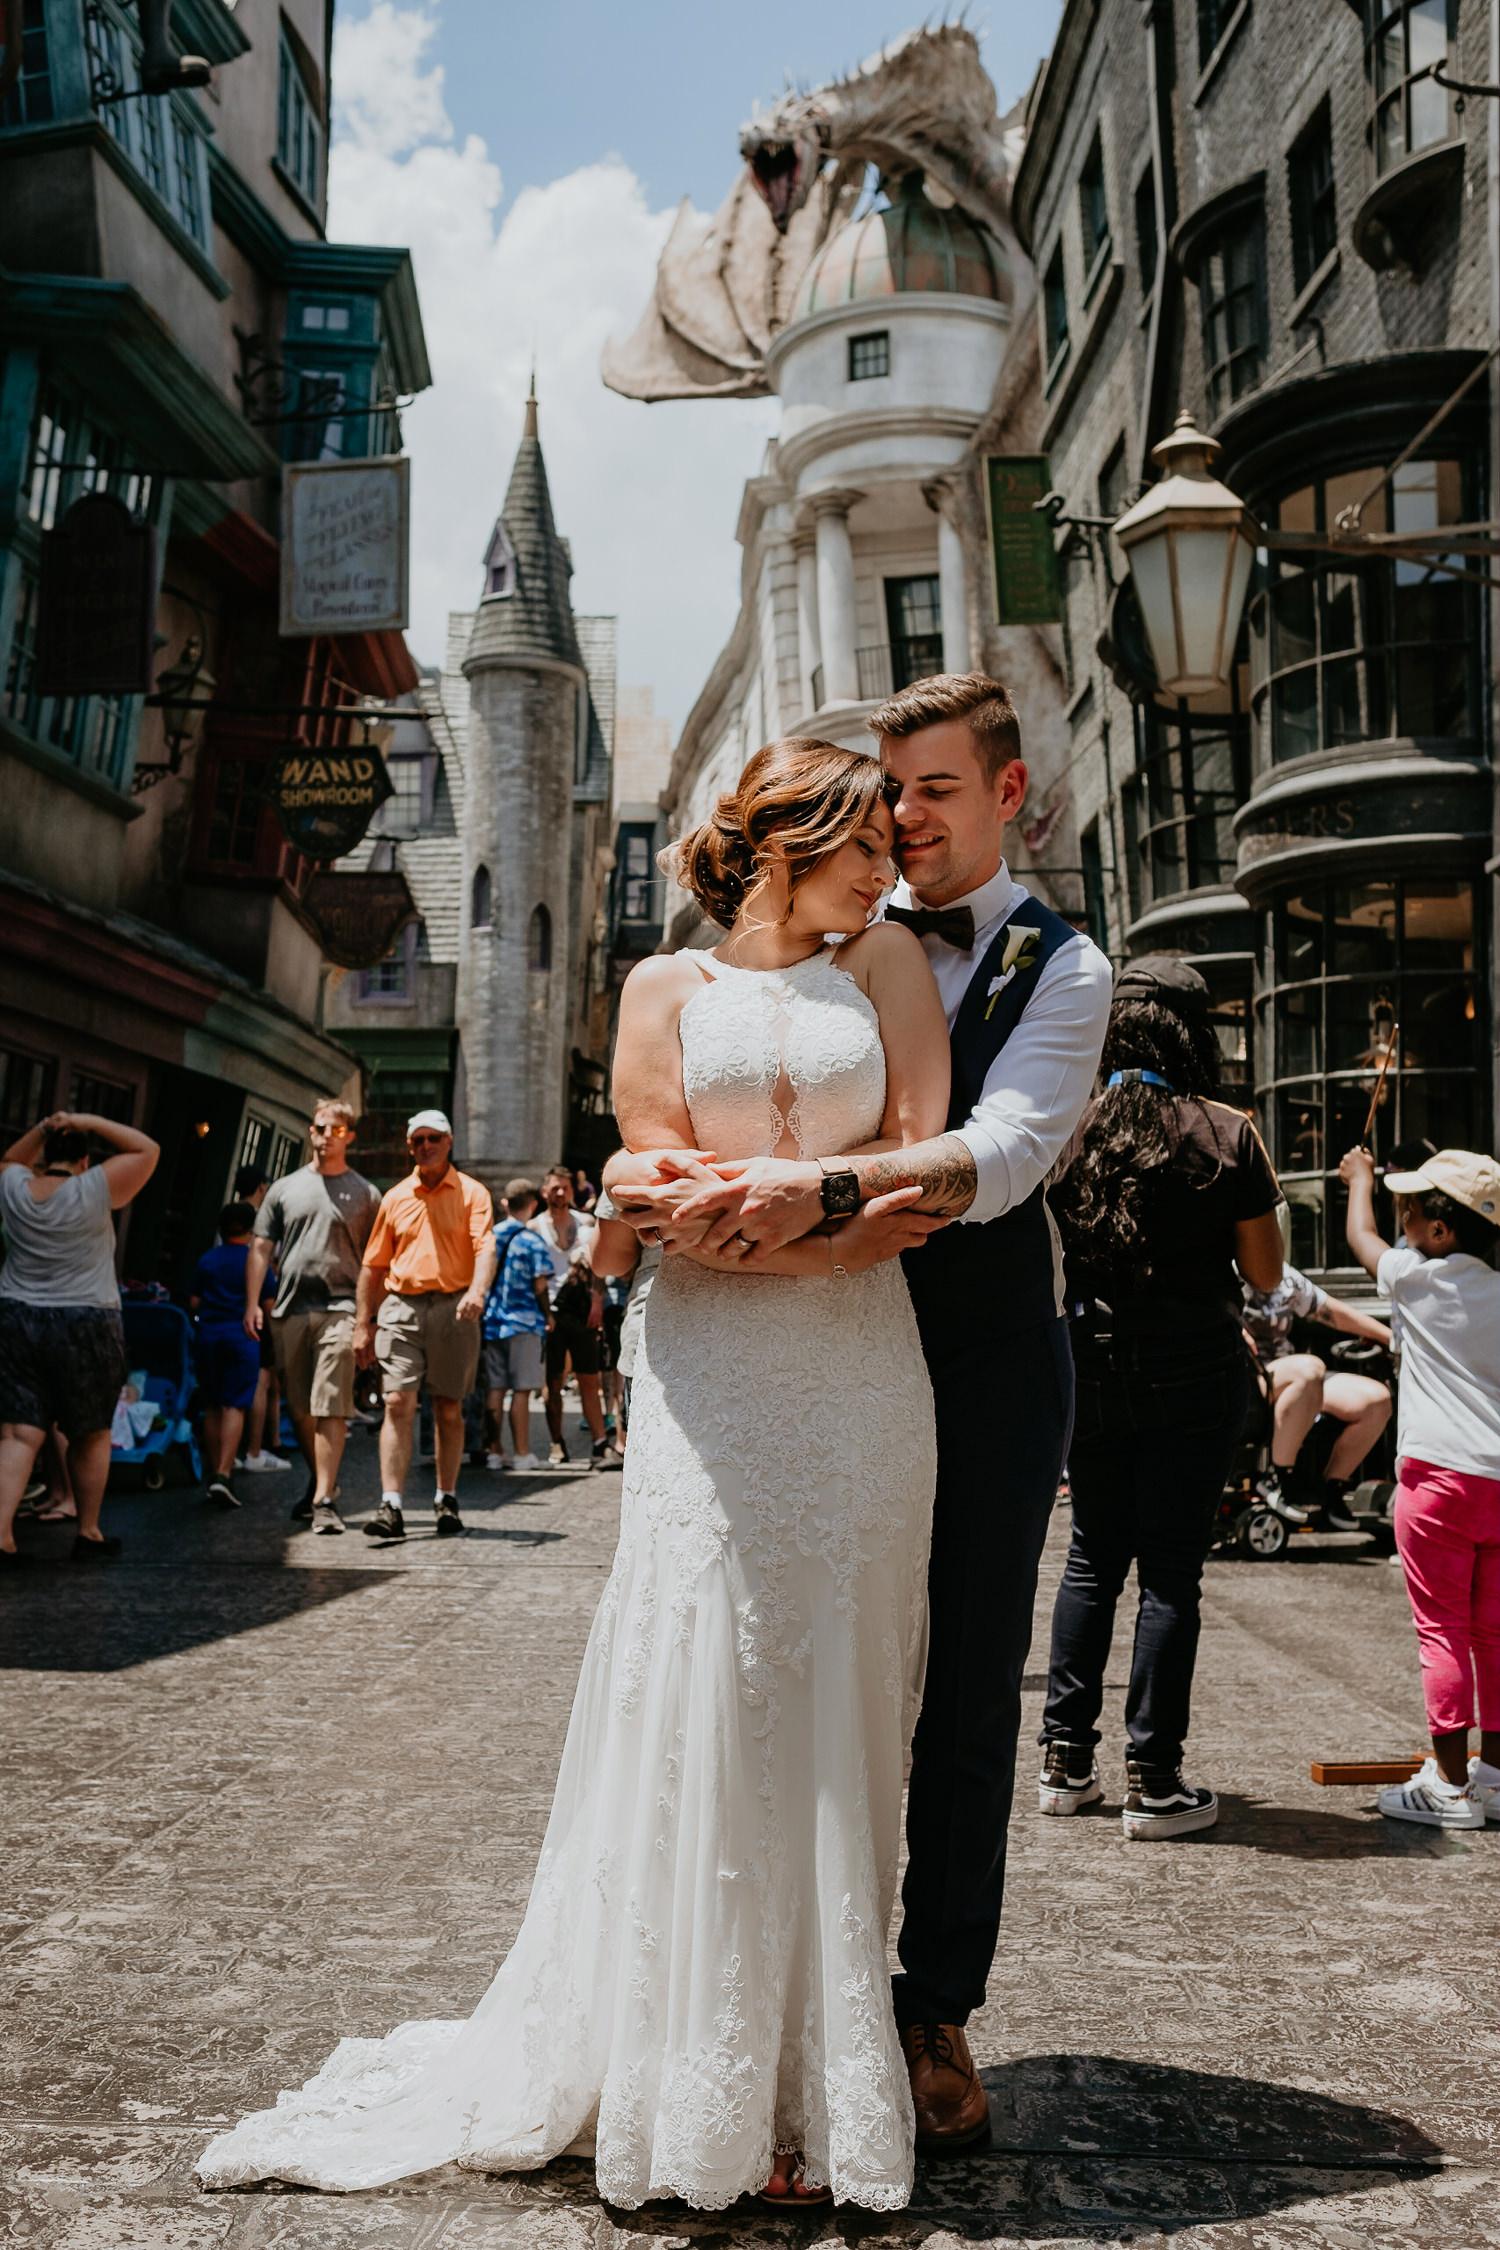 groom hugging bride from behind in front of Gringotts Bank